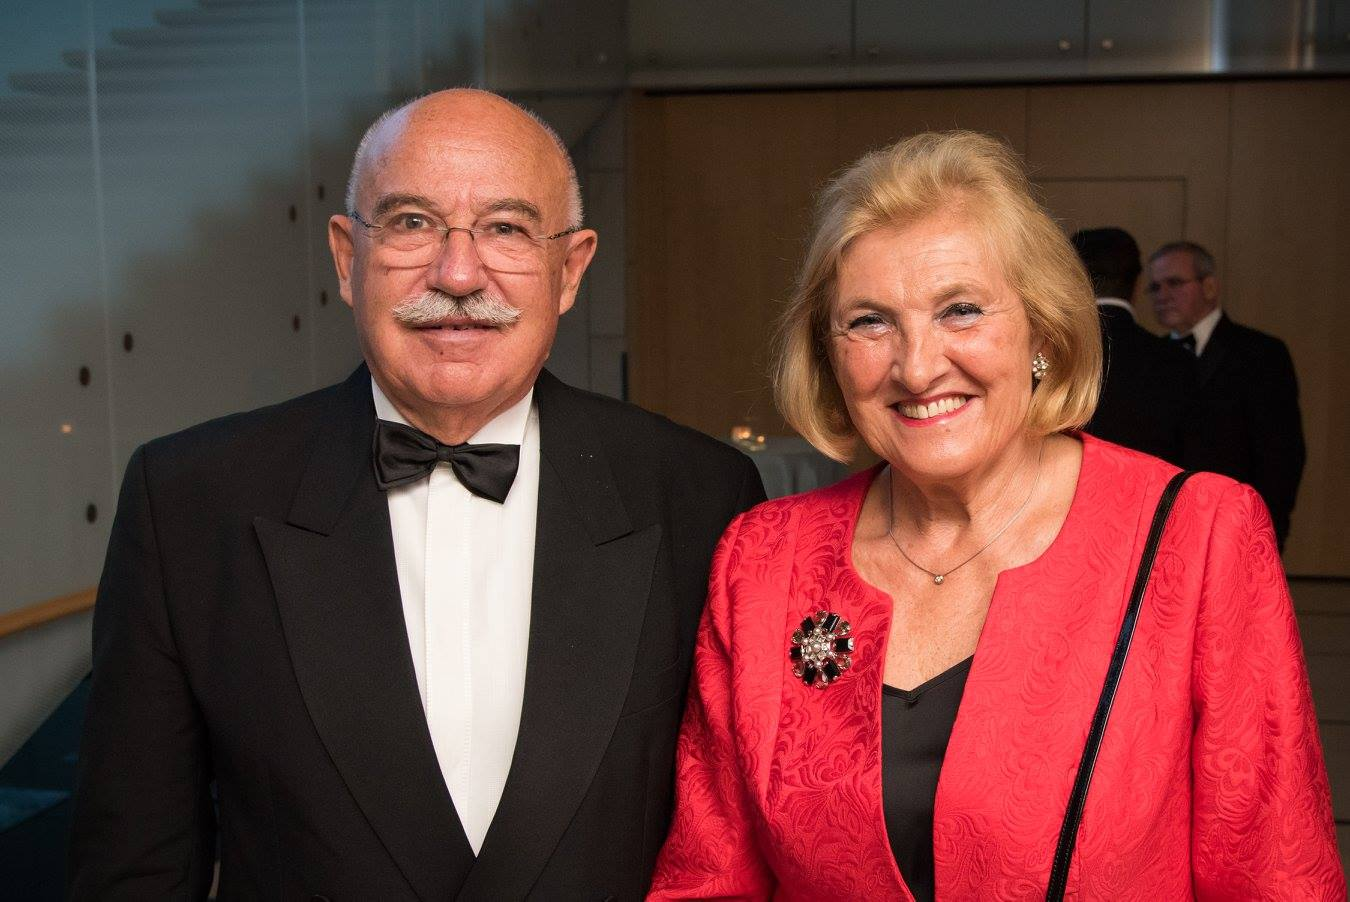 Dr. János Martonyi and his wife Dr. Rozália Rábai